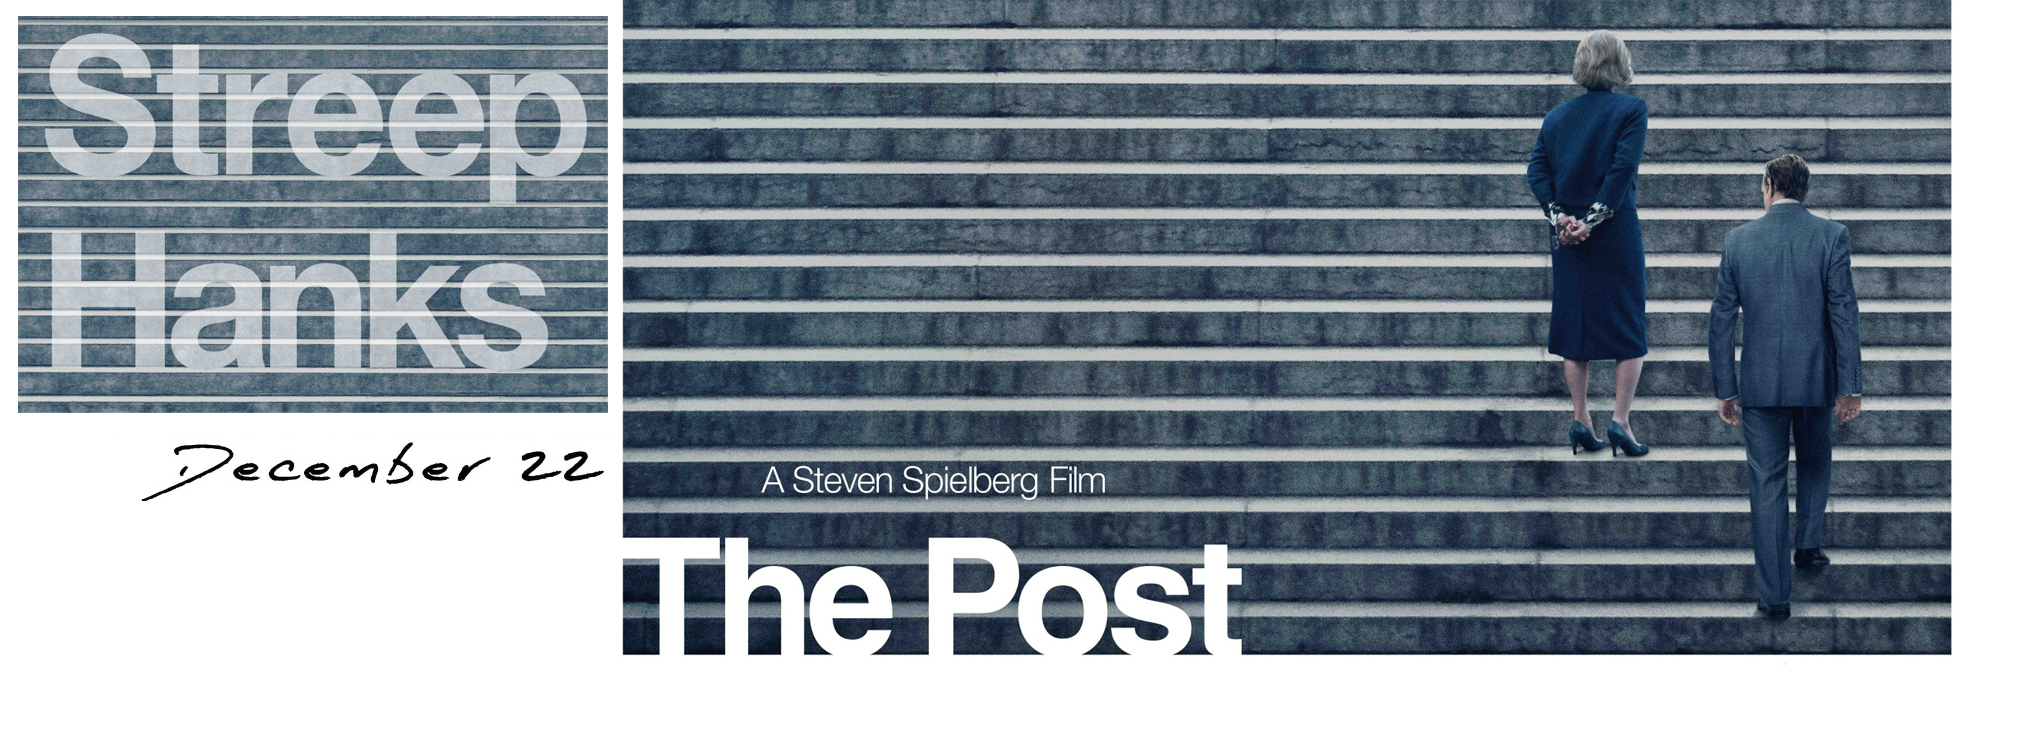 Slider image for The Post